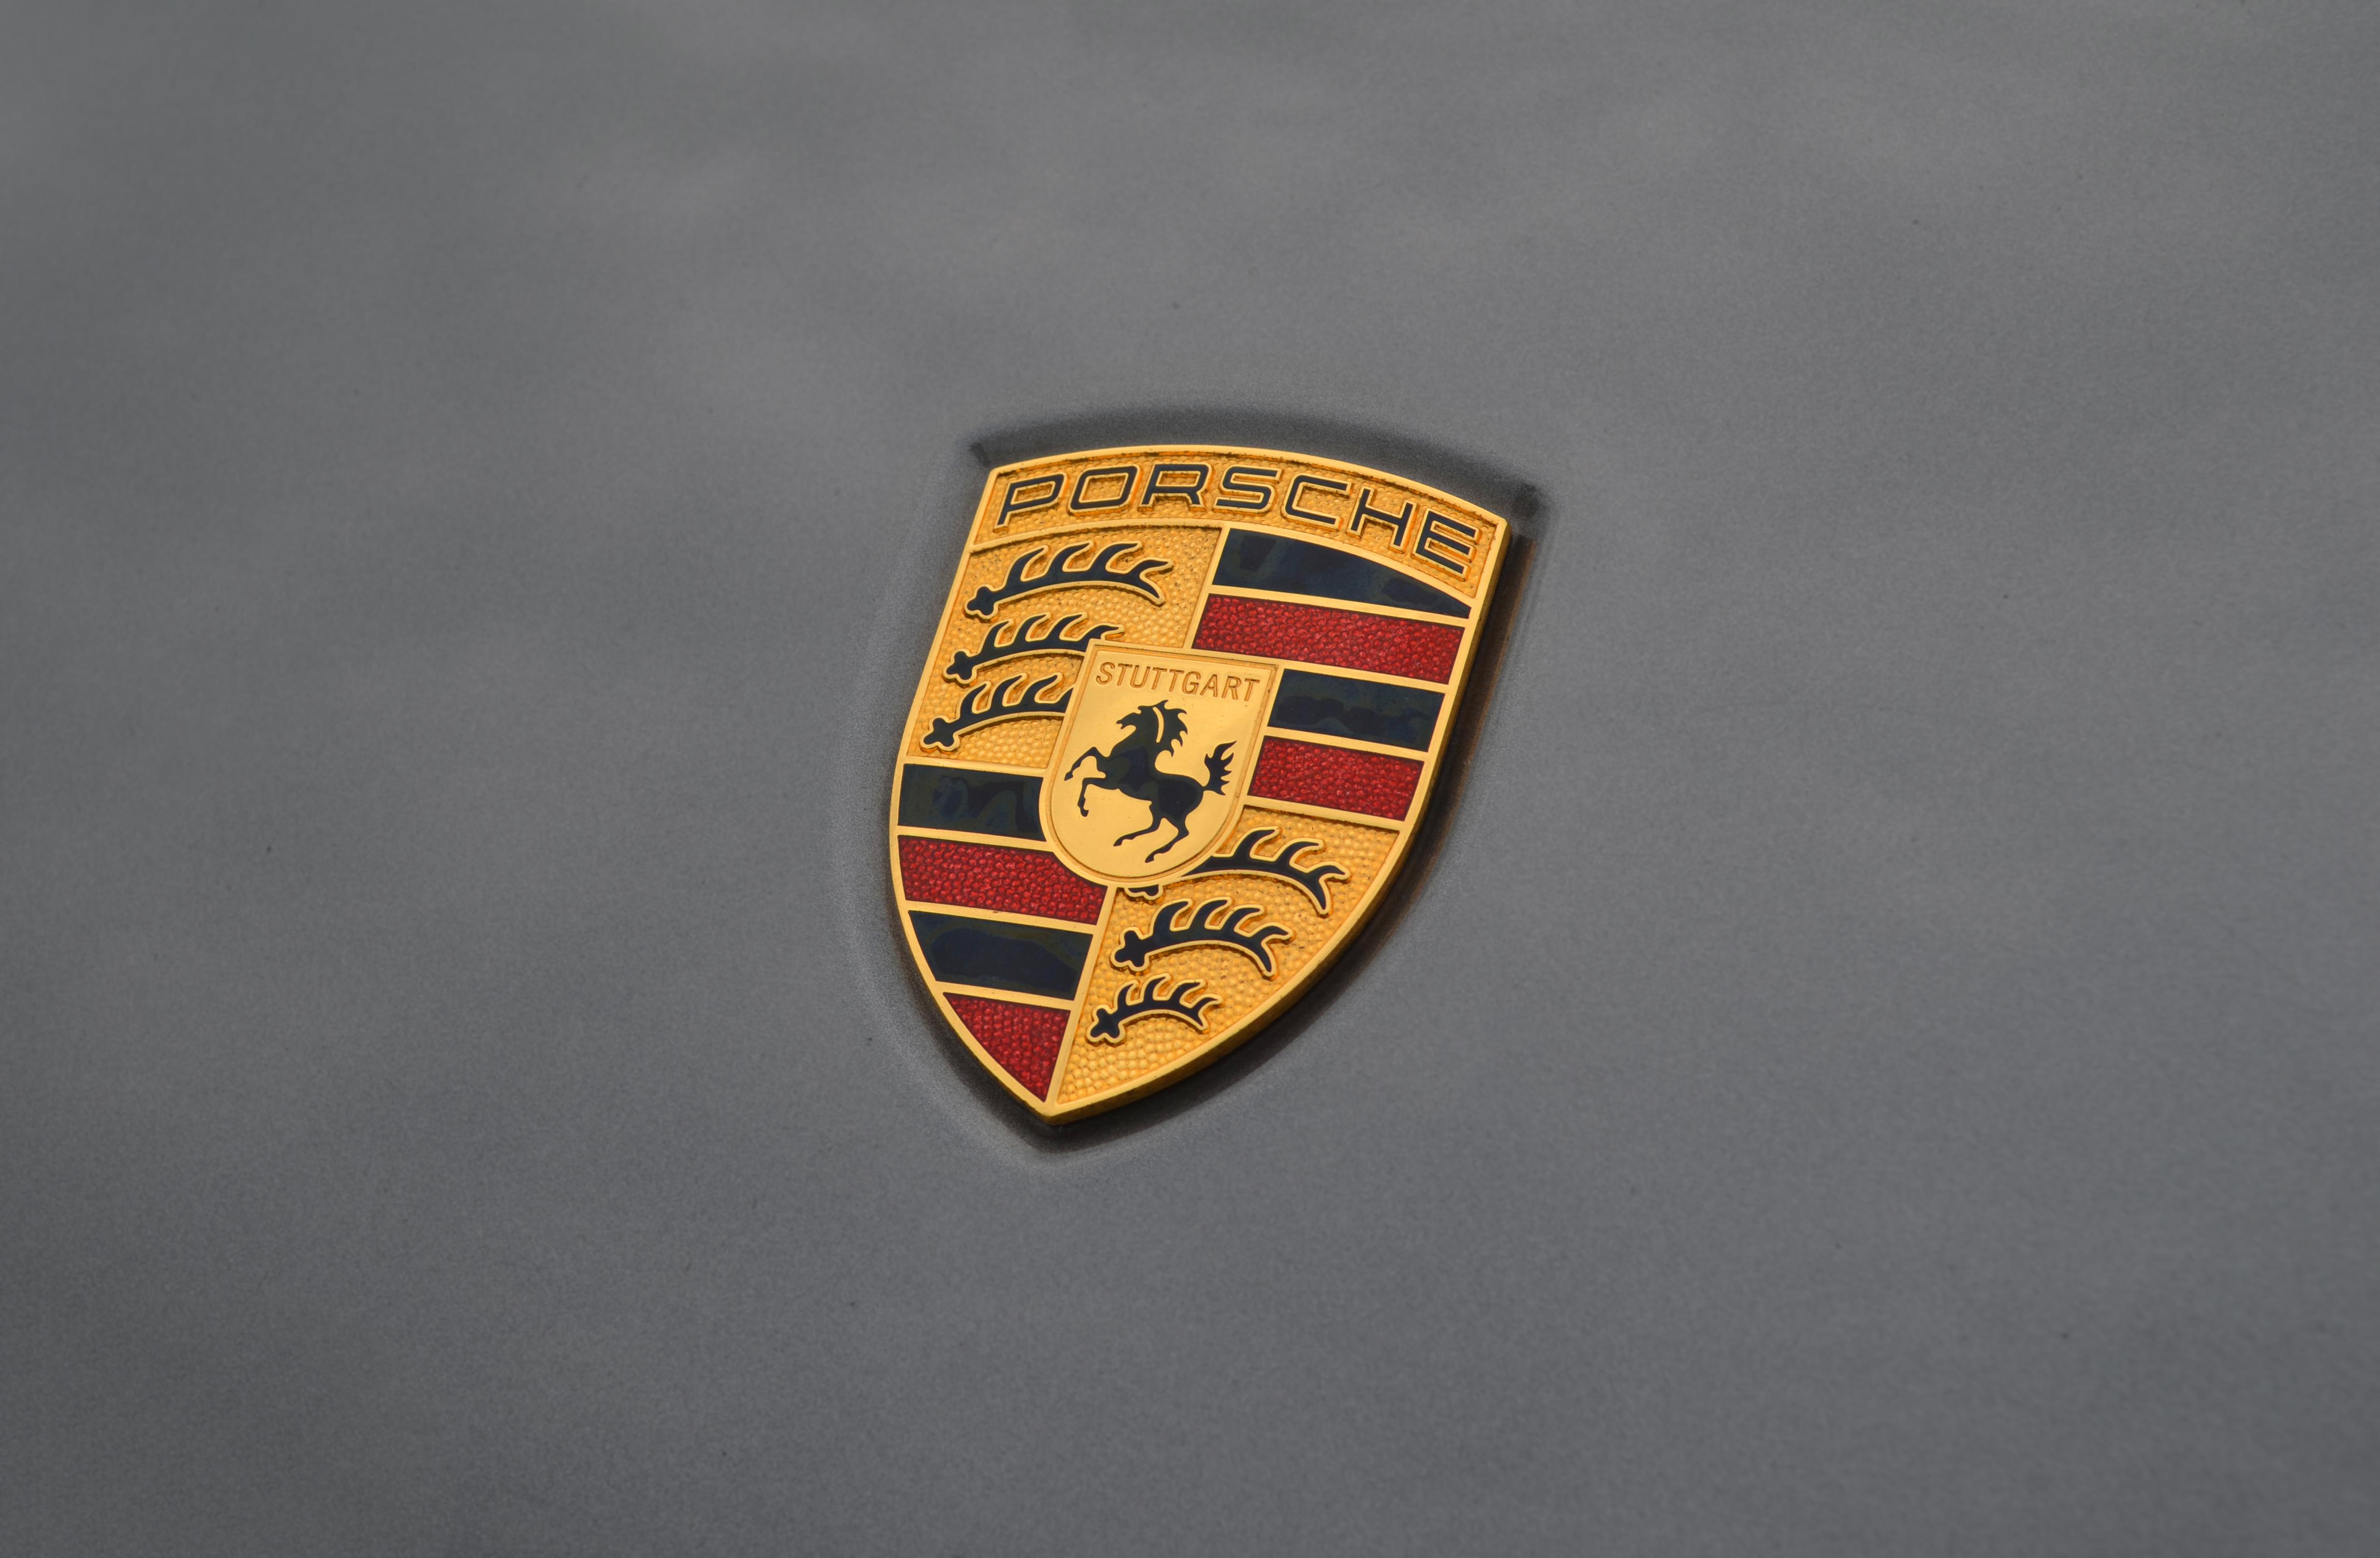 Gambar Seni Lambang Porsche Kendaraan Lencana Mobil Logo Puncak Simbol Merek Dagang Fashion Aksesori Supercar Lamborghini 4598x3009 Crea Park 1596434 Galeri Foto Pxhere